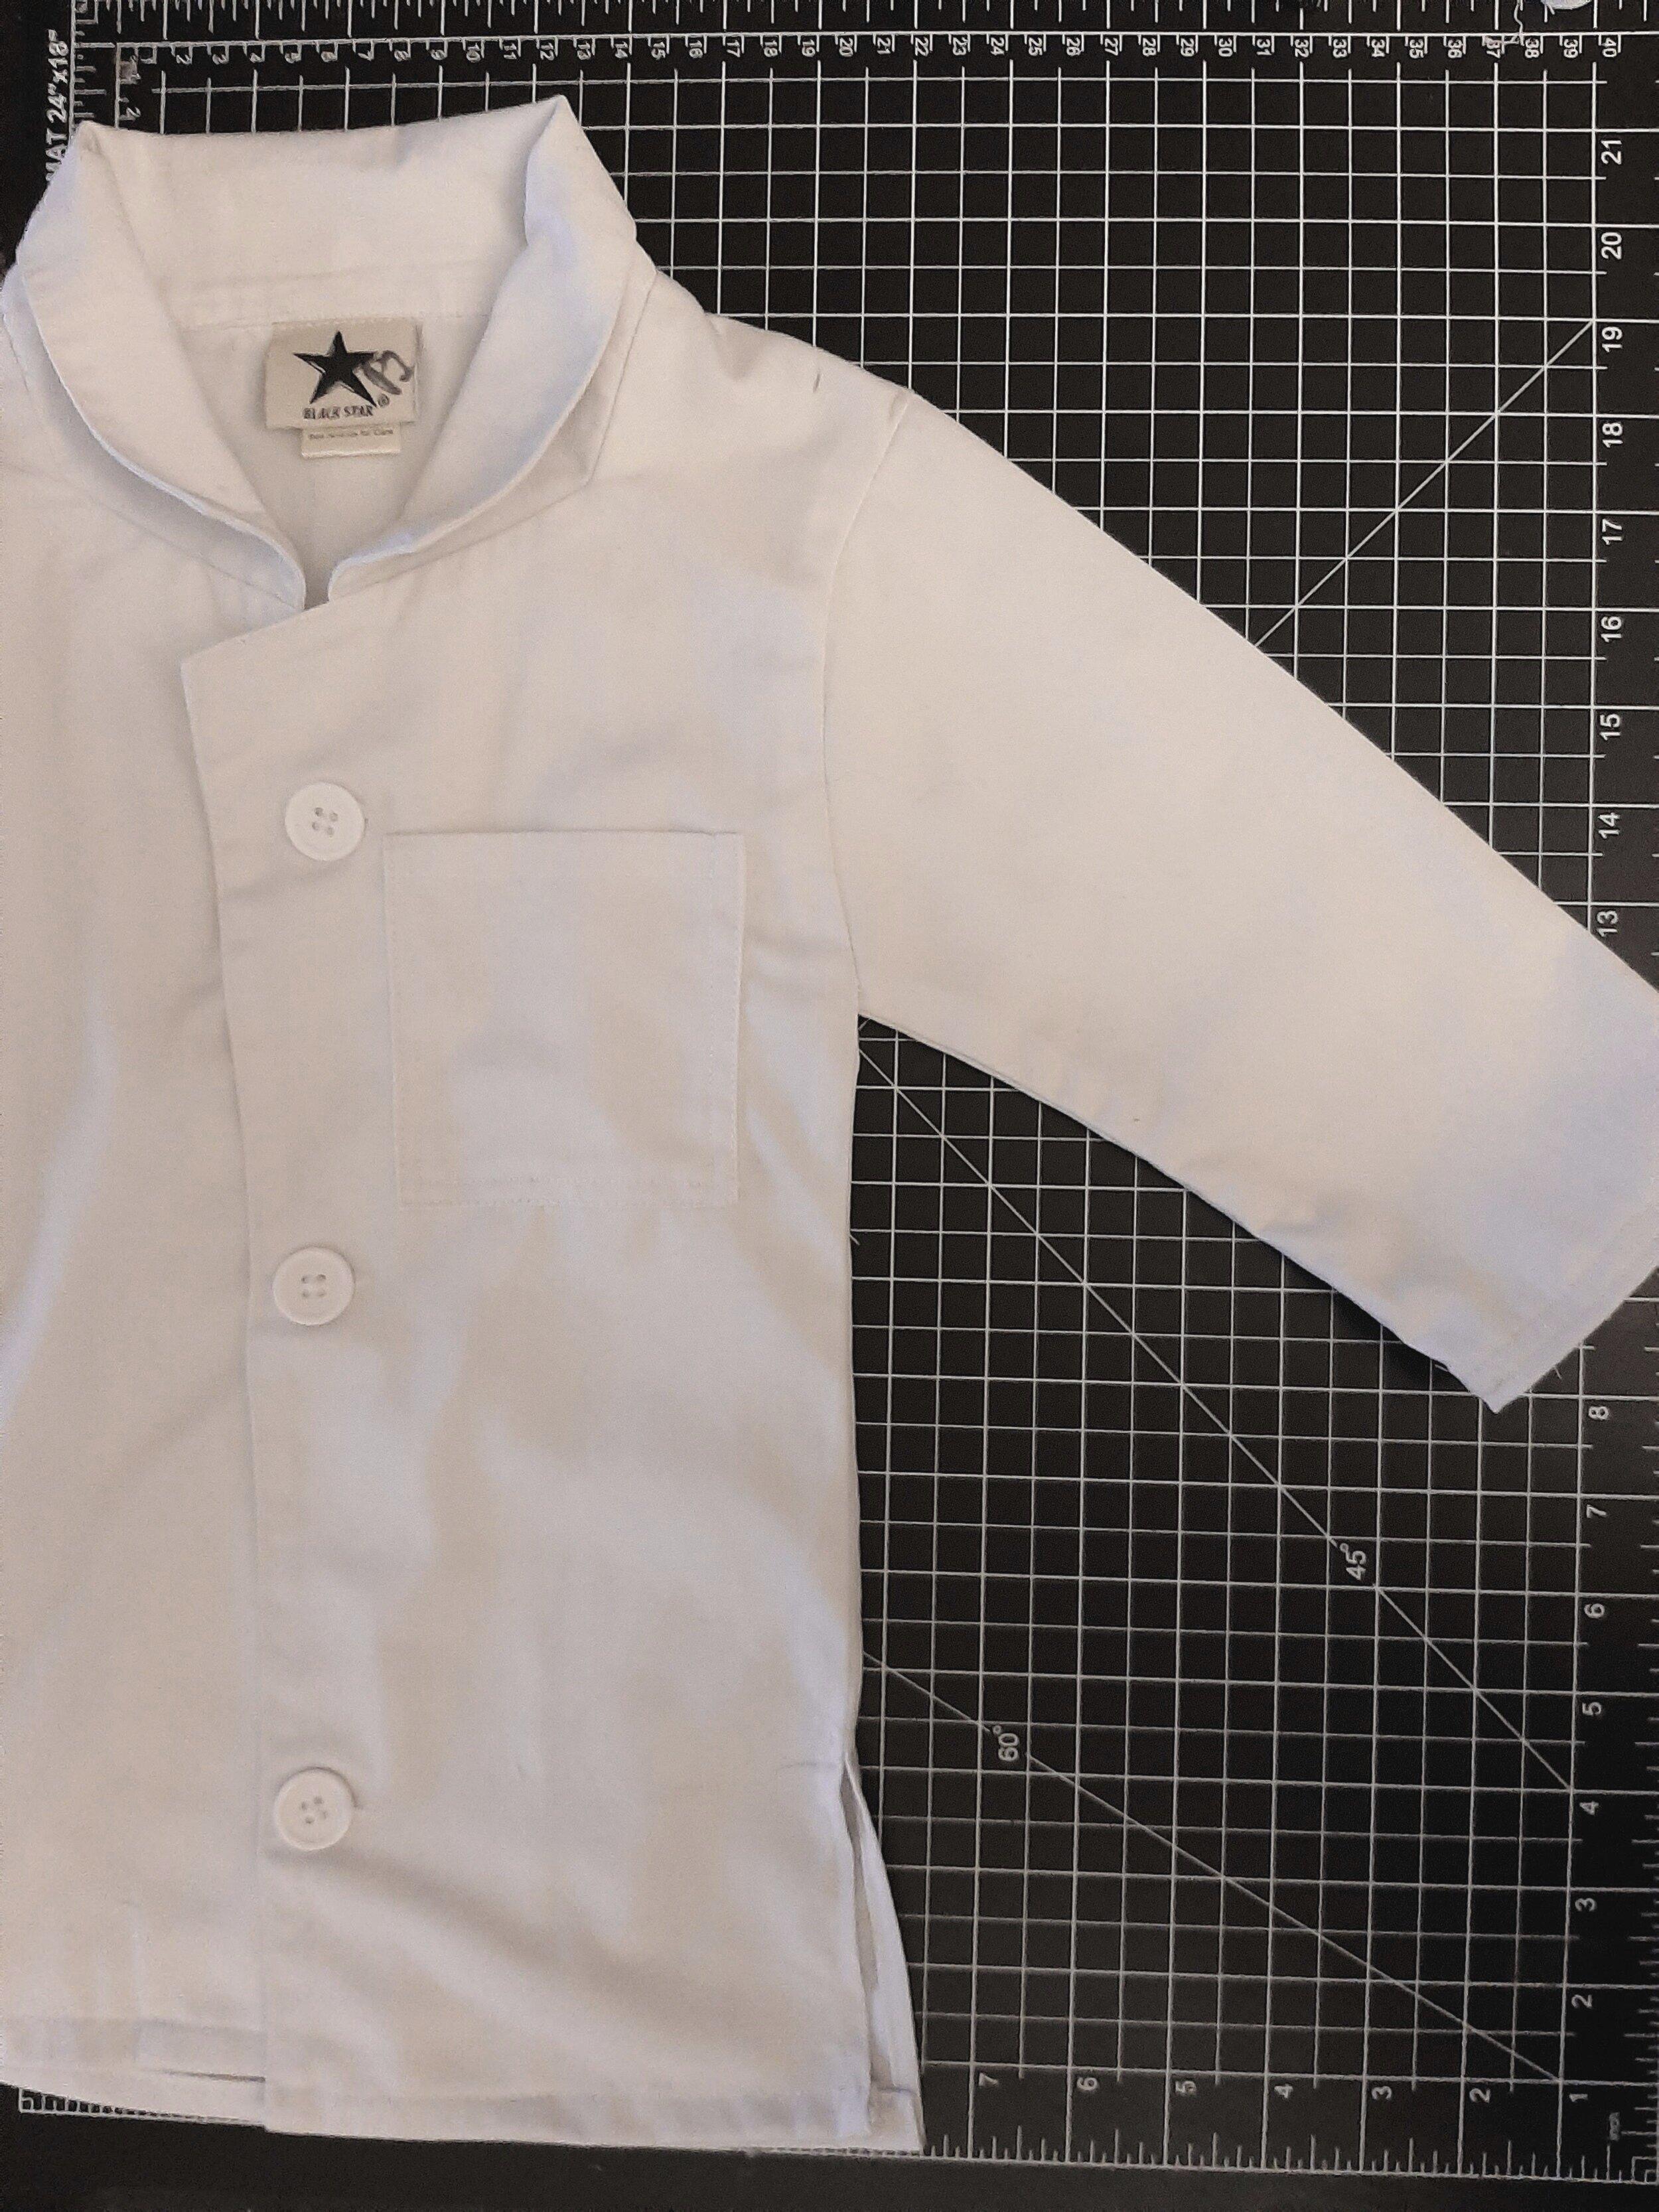 Labcoat fit for a toddler -